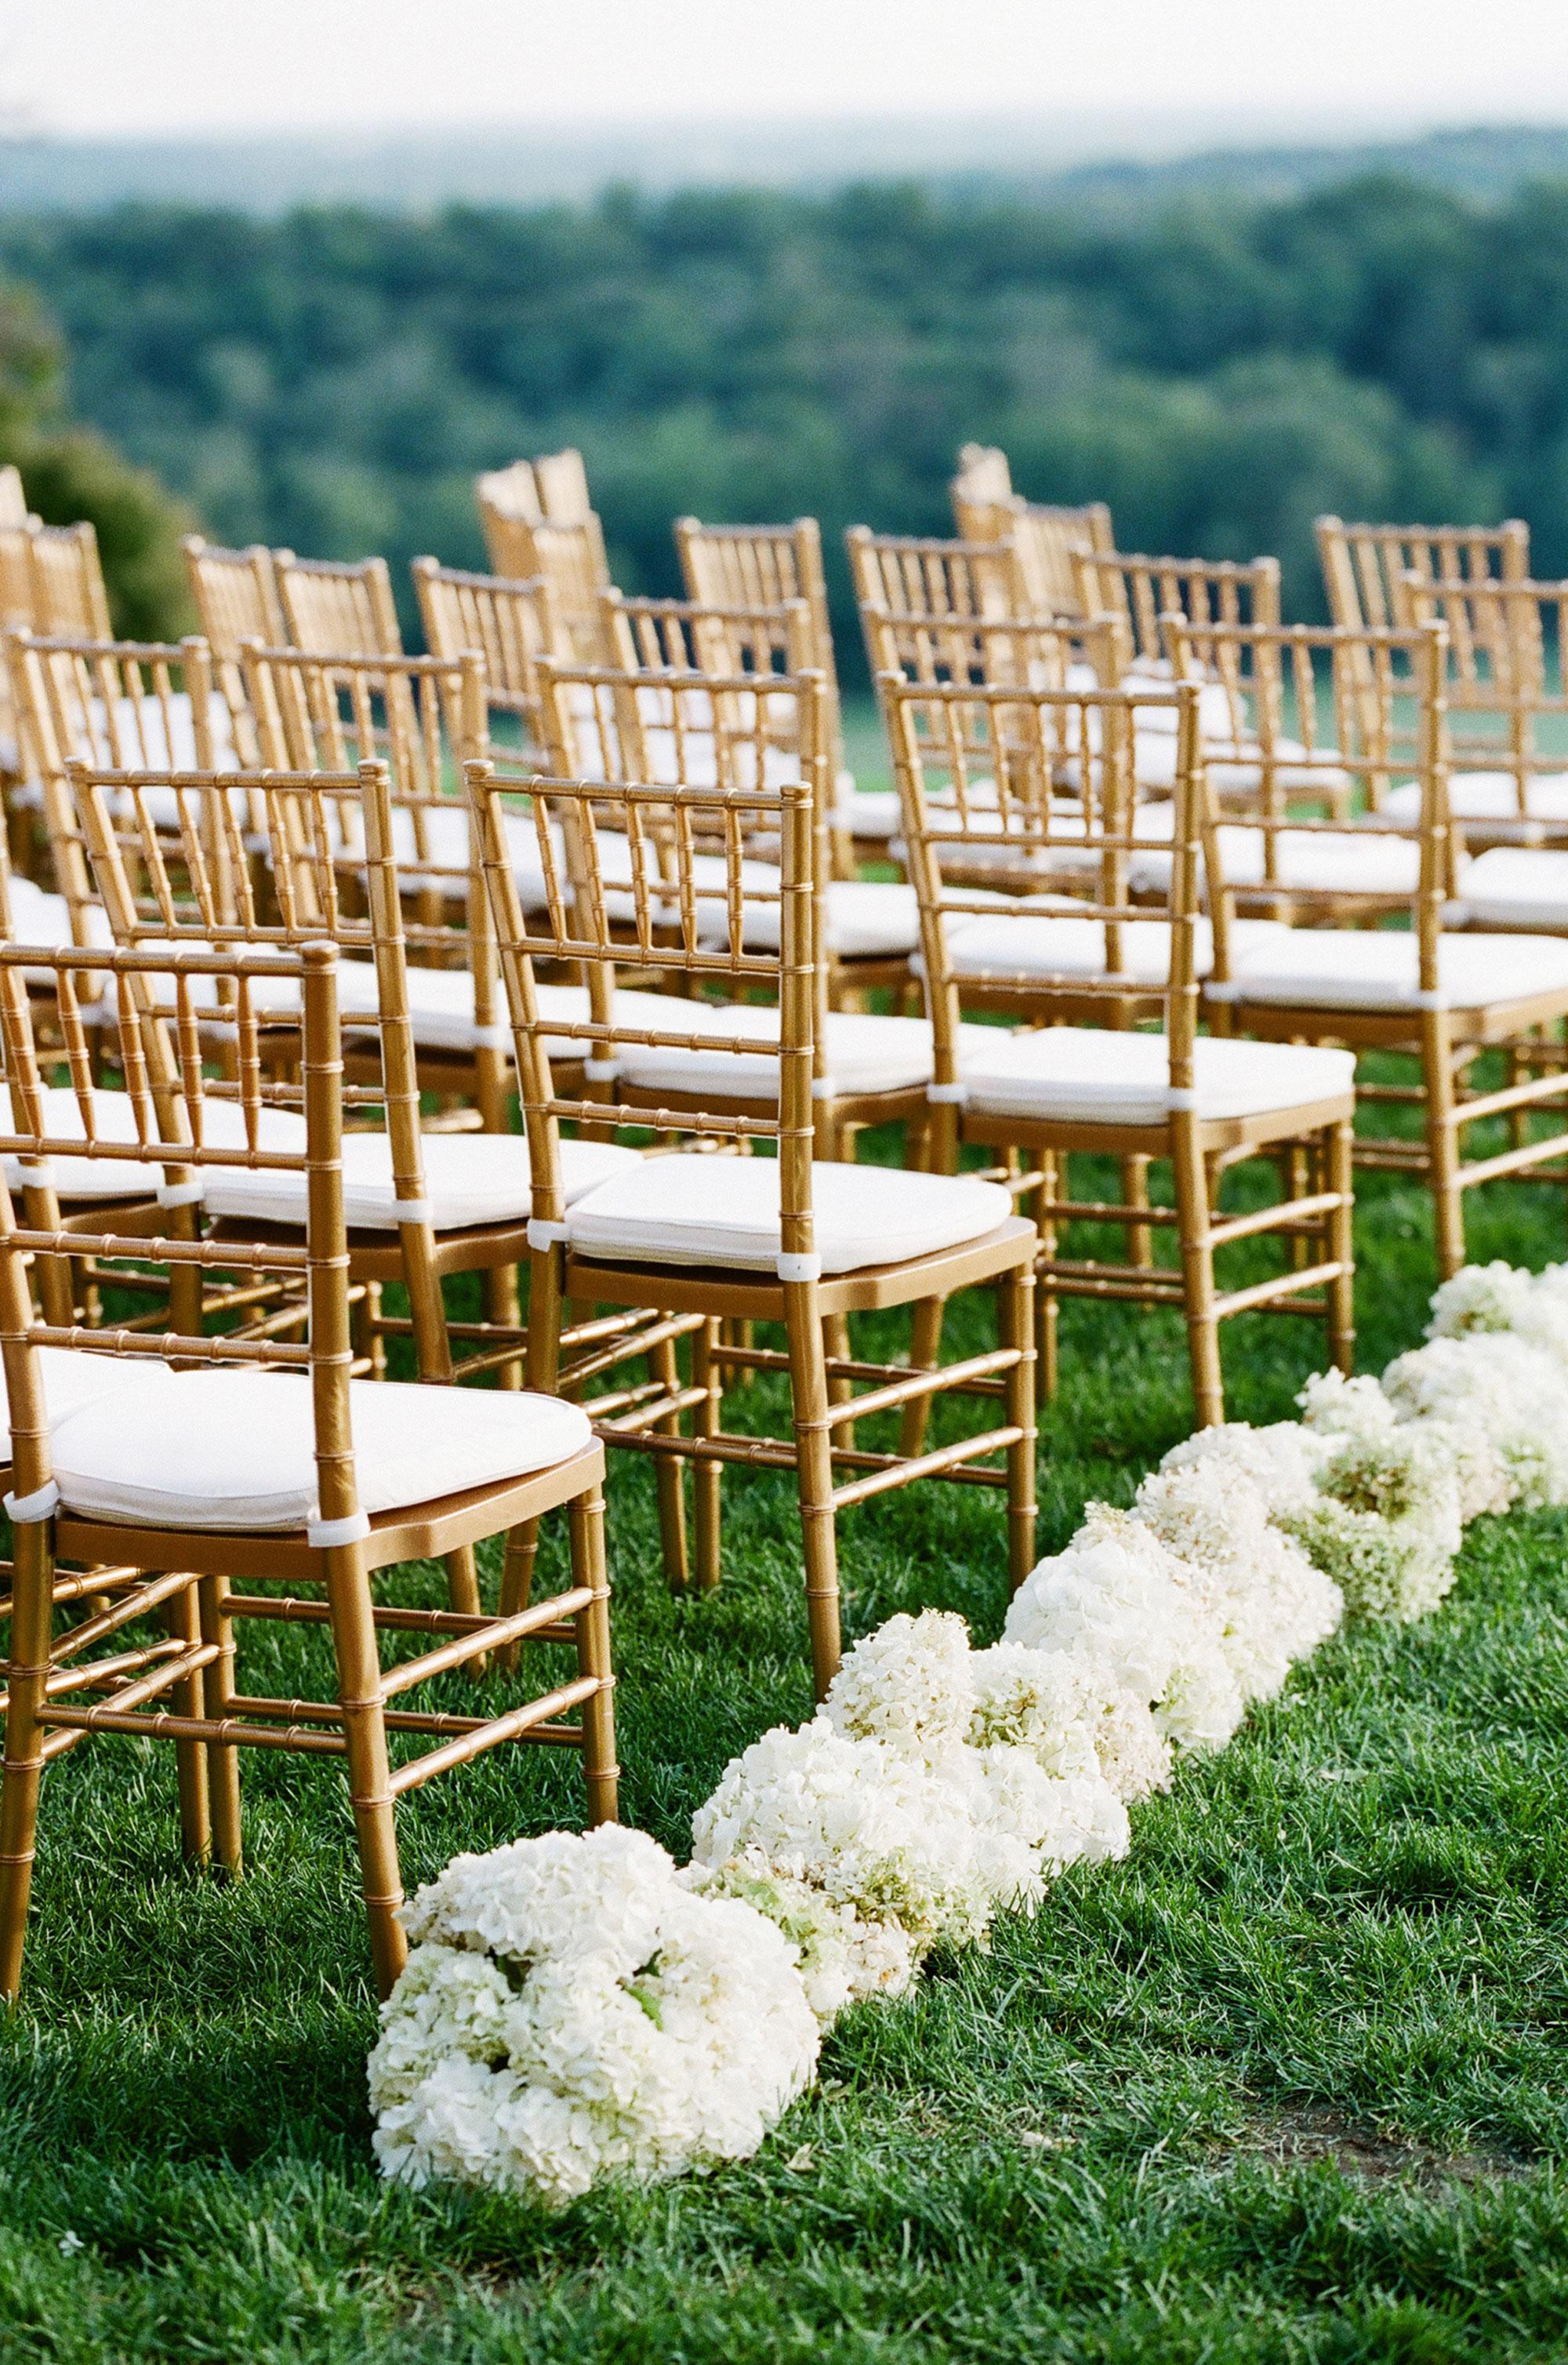 Hydrangea outdoor wedding ceremony aisle decor by David Beahm Experiences